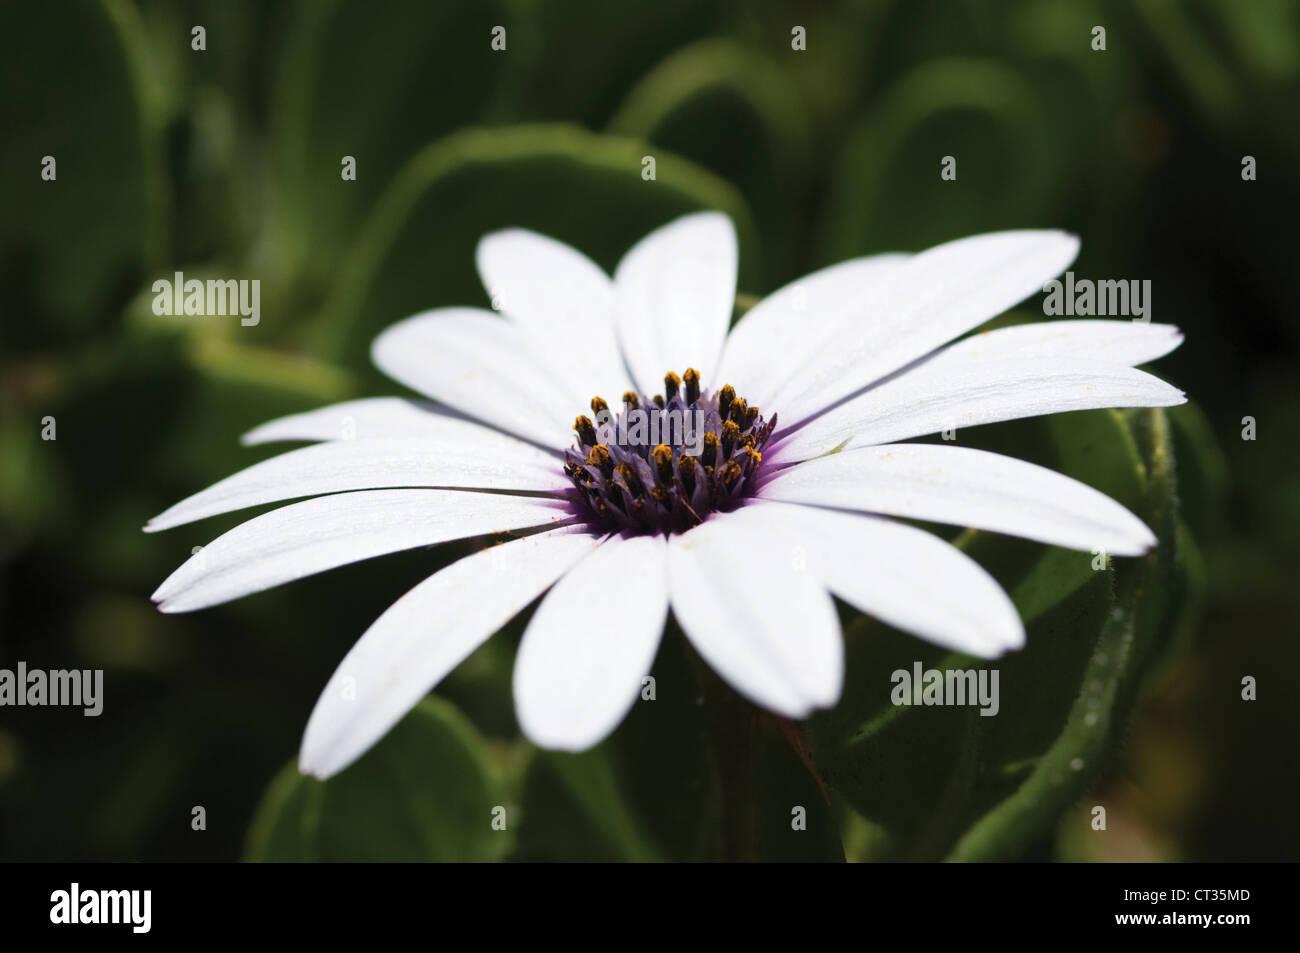 Osteospermum, Osteospermum , Cape daisy - Stock Image